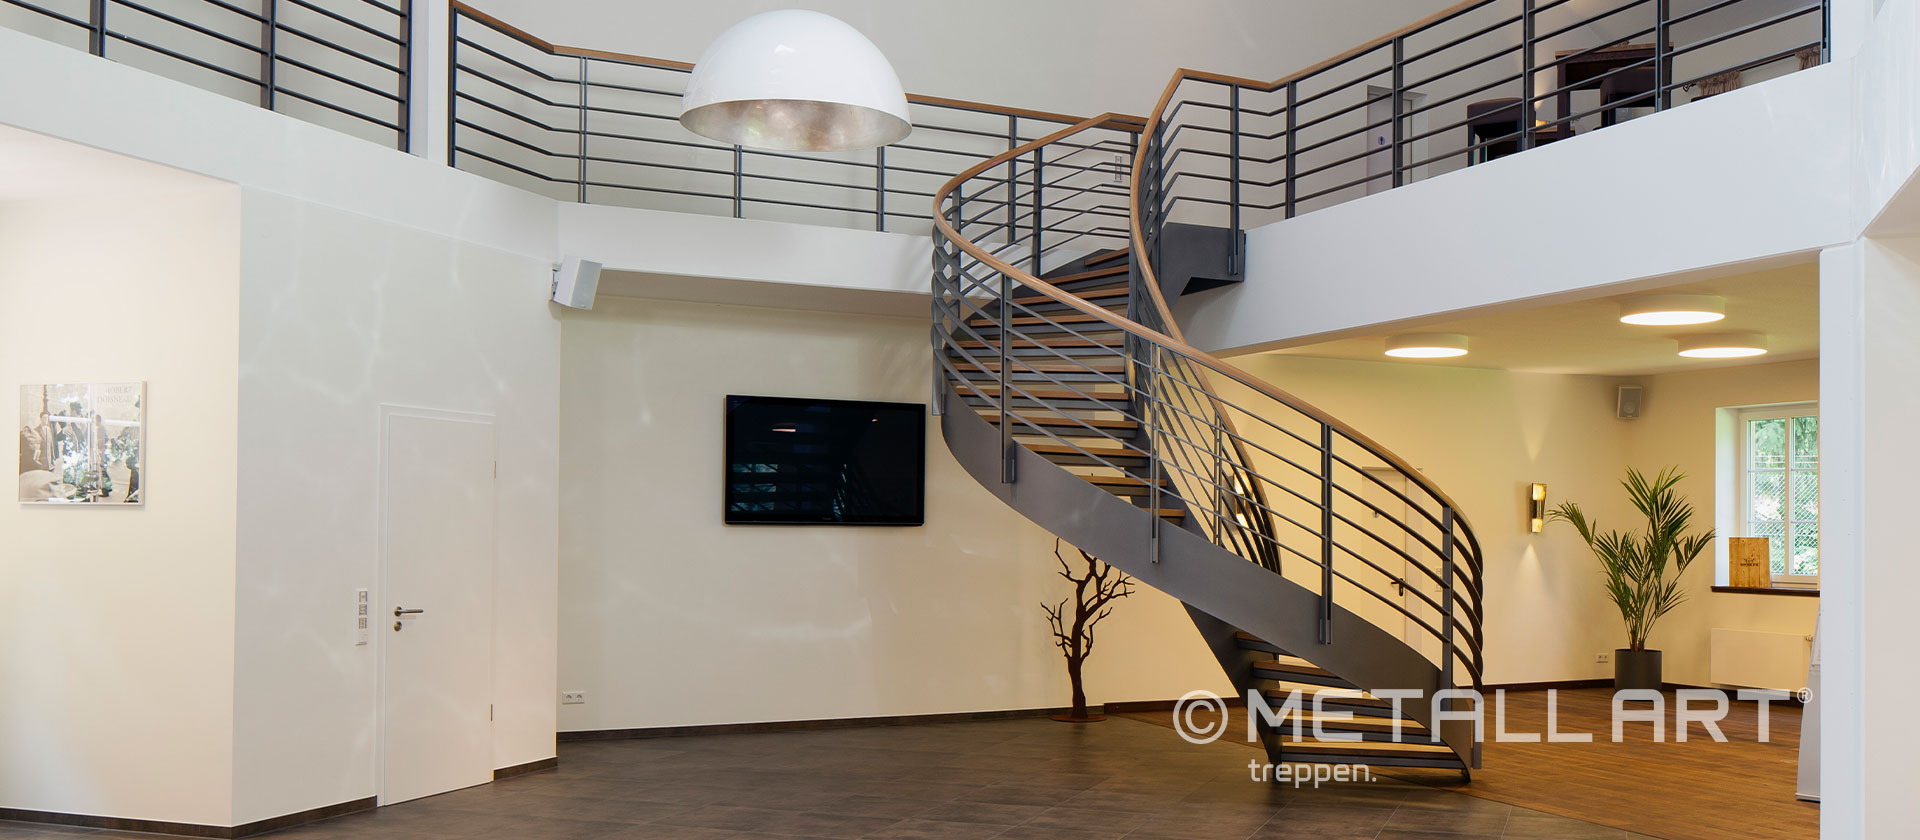 Treppe als Gestaltungselement